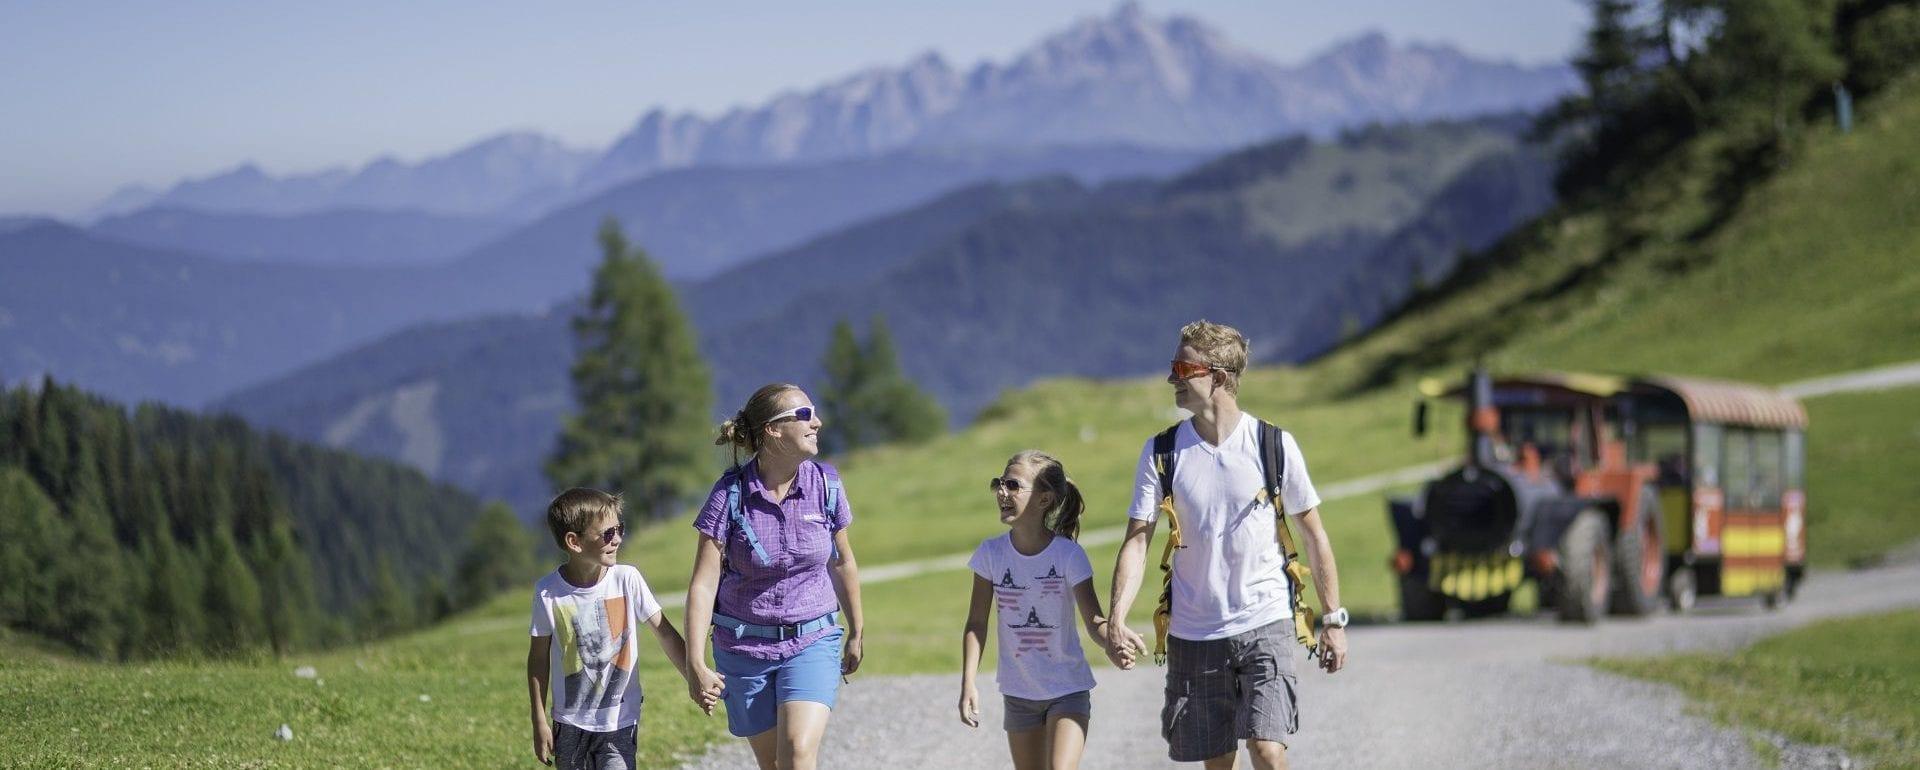 Familien Wandern Urlaub Salzburger Land